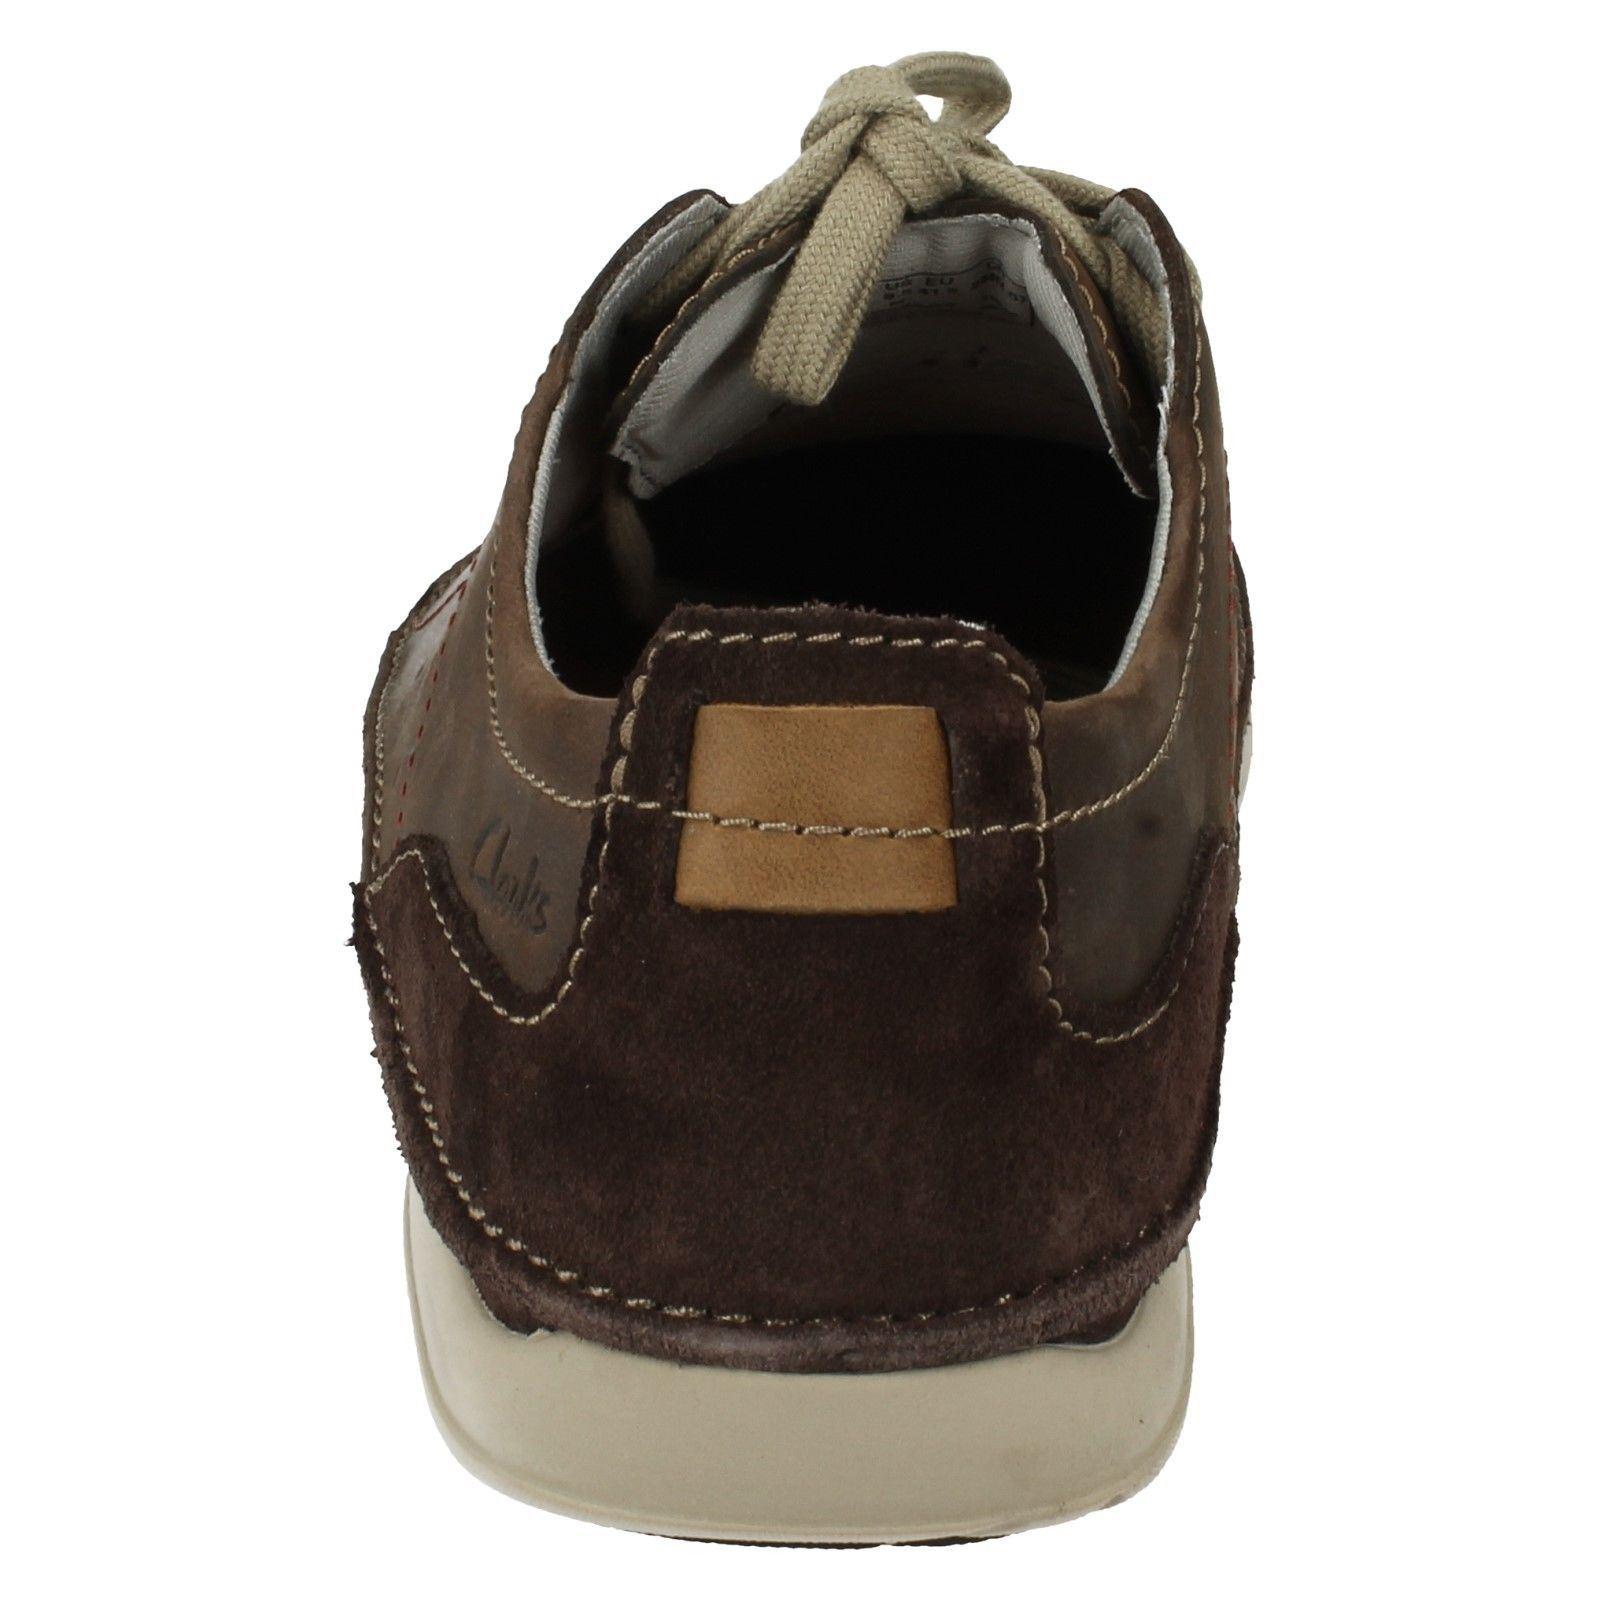 Men's Clarks Shoes Lightweight Casual Lace Up Shoes Clarks Label - Trikeyon Fly c08c9d